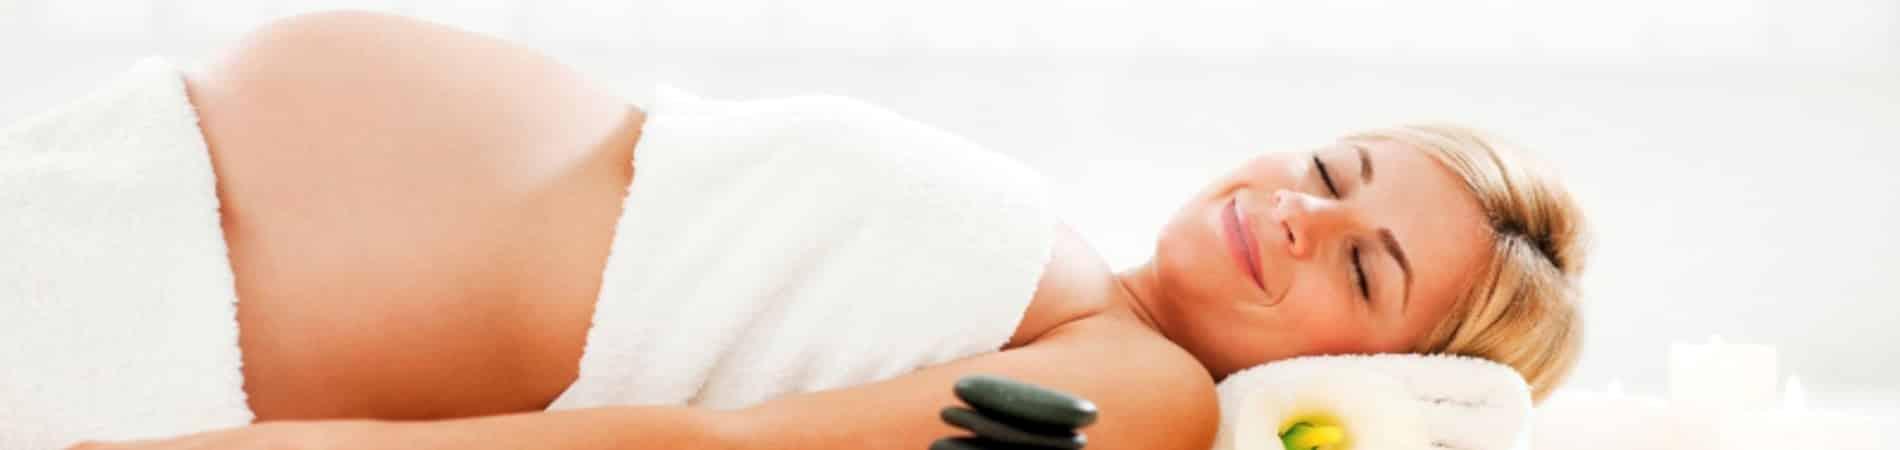 masaje-prenatal-ima-1